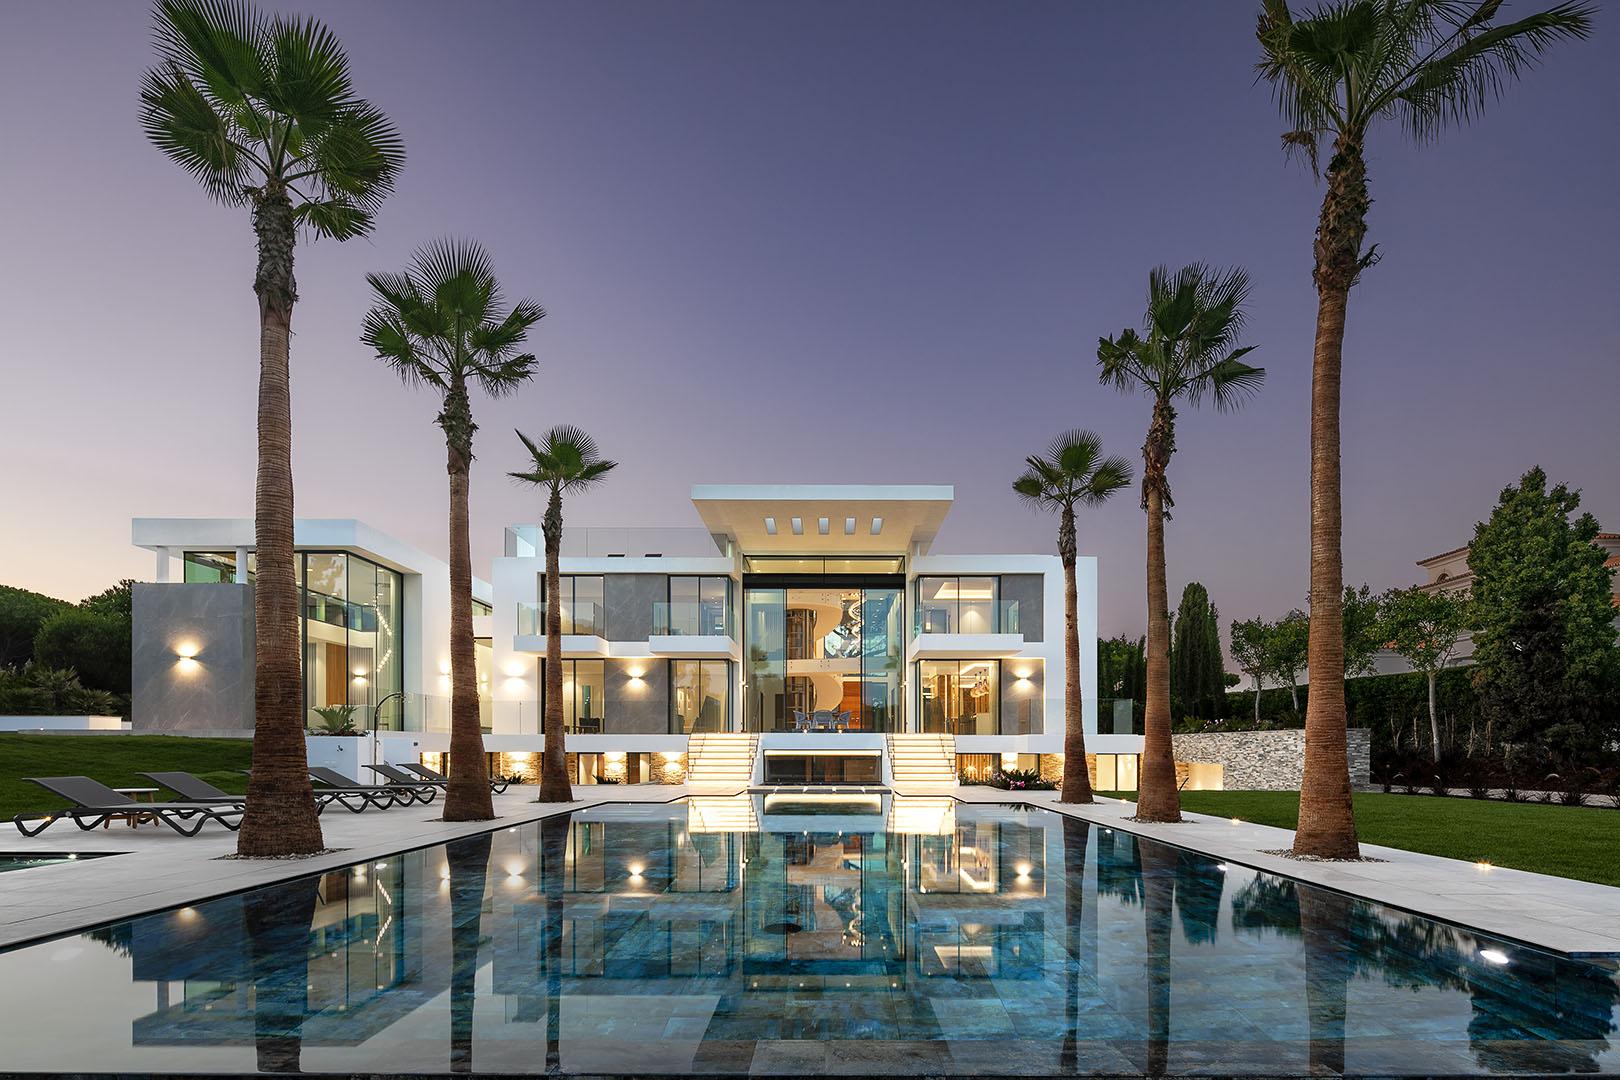 Exquisite brand new villa set on a spacious plot